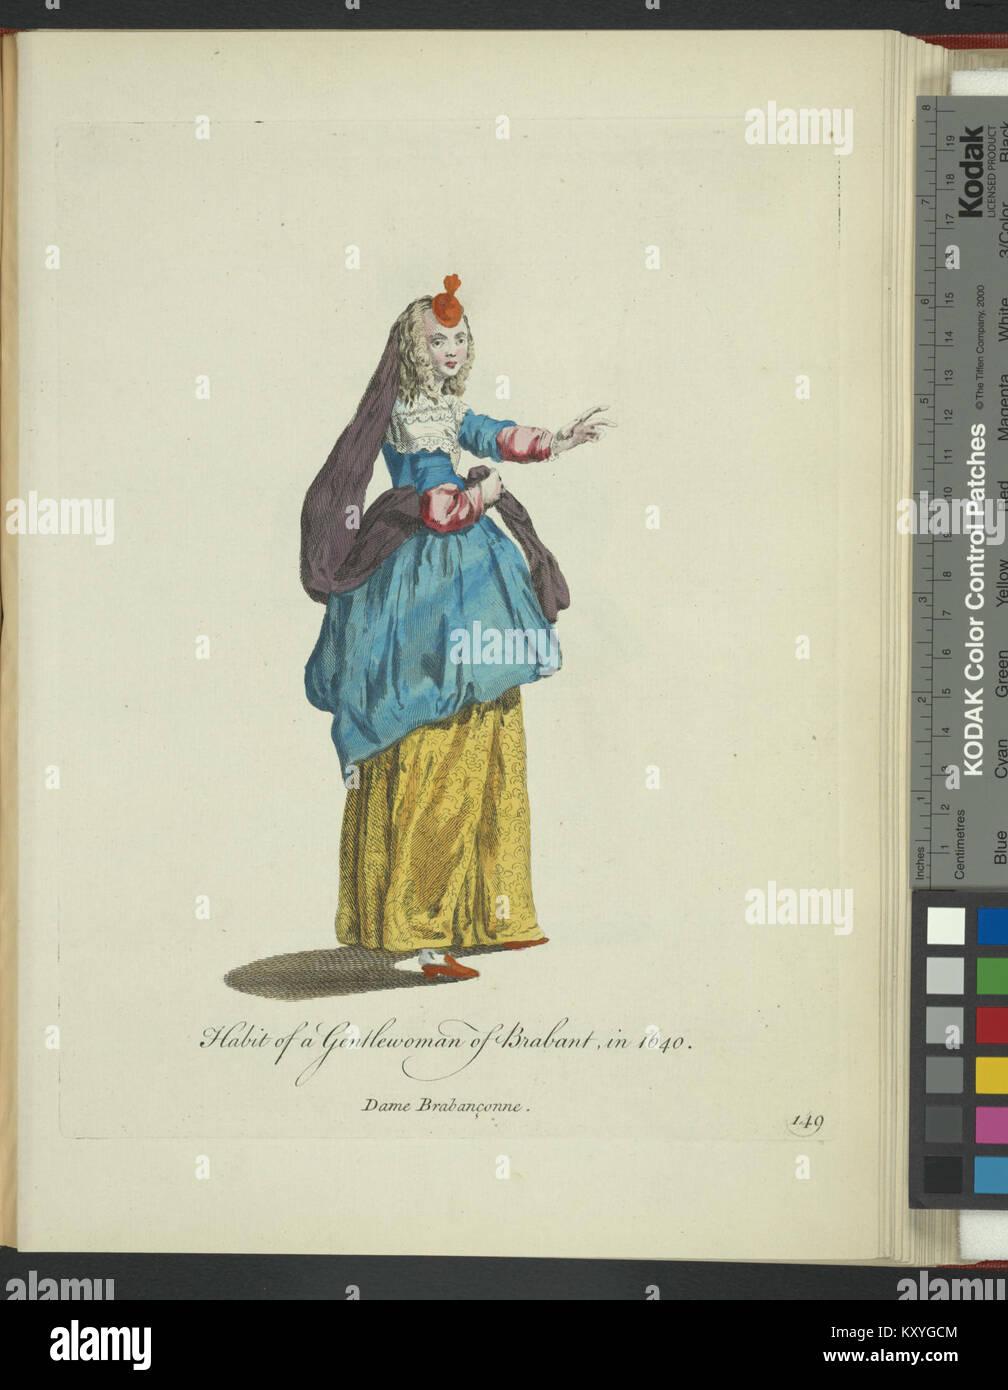 Habit of a gentlewoman of Brabant in 1640. Dame Brabançonne (NYPL  b14140320-1638160